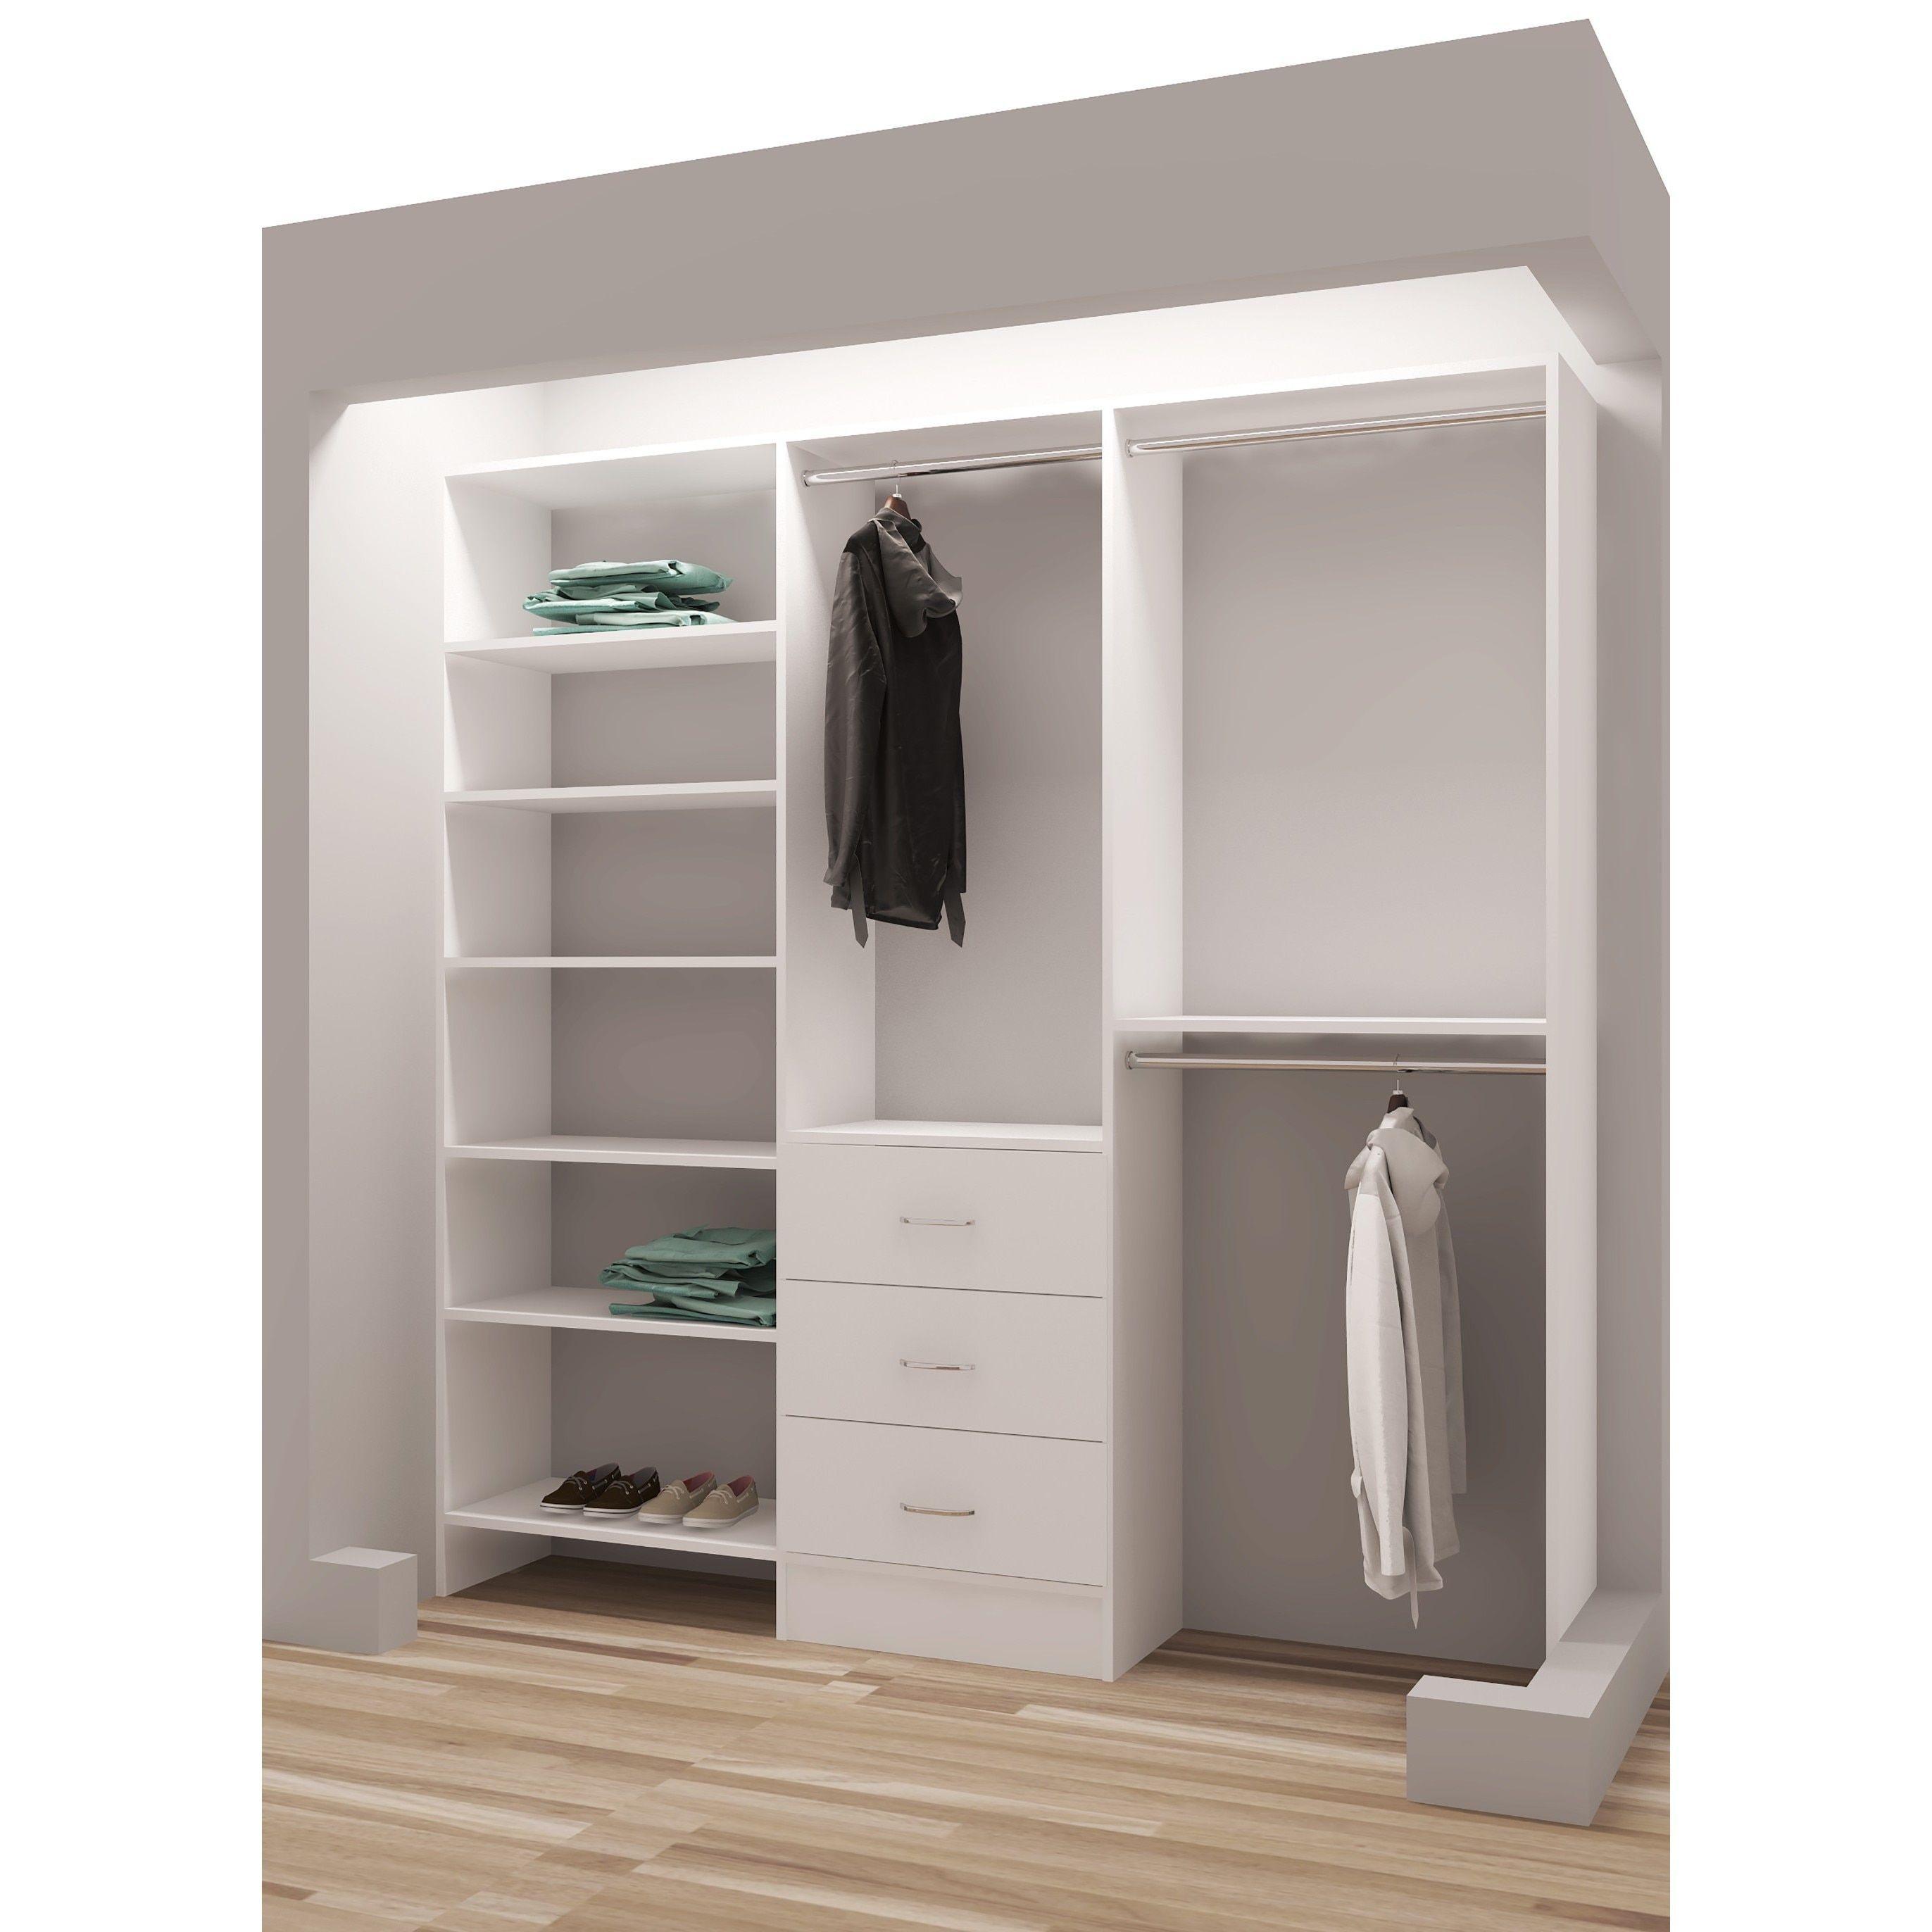 TidySquares Classic White Wood 75-inch Reach-in Closet Organizer ...